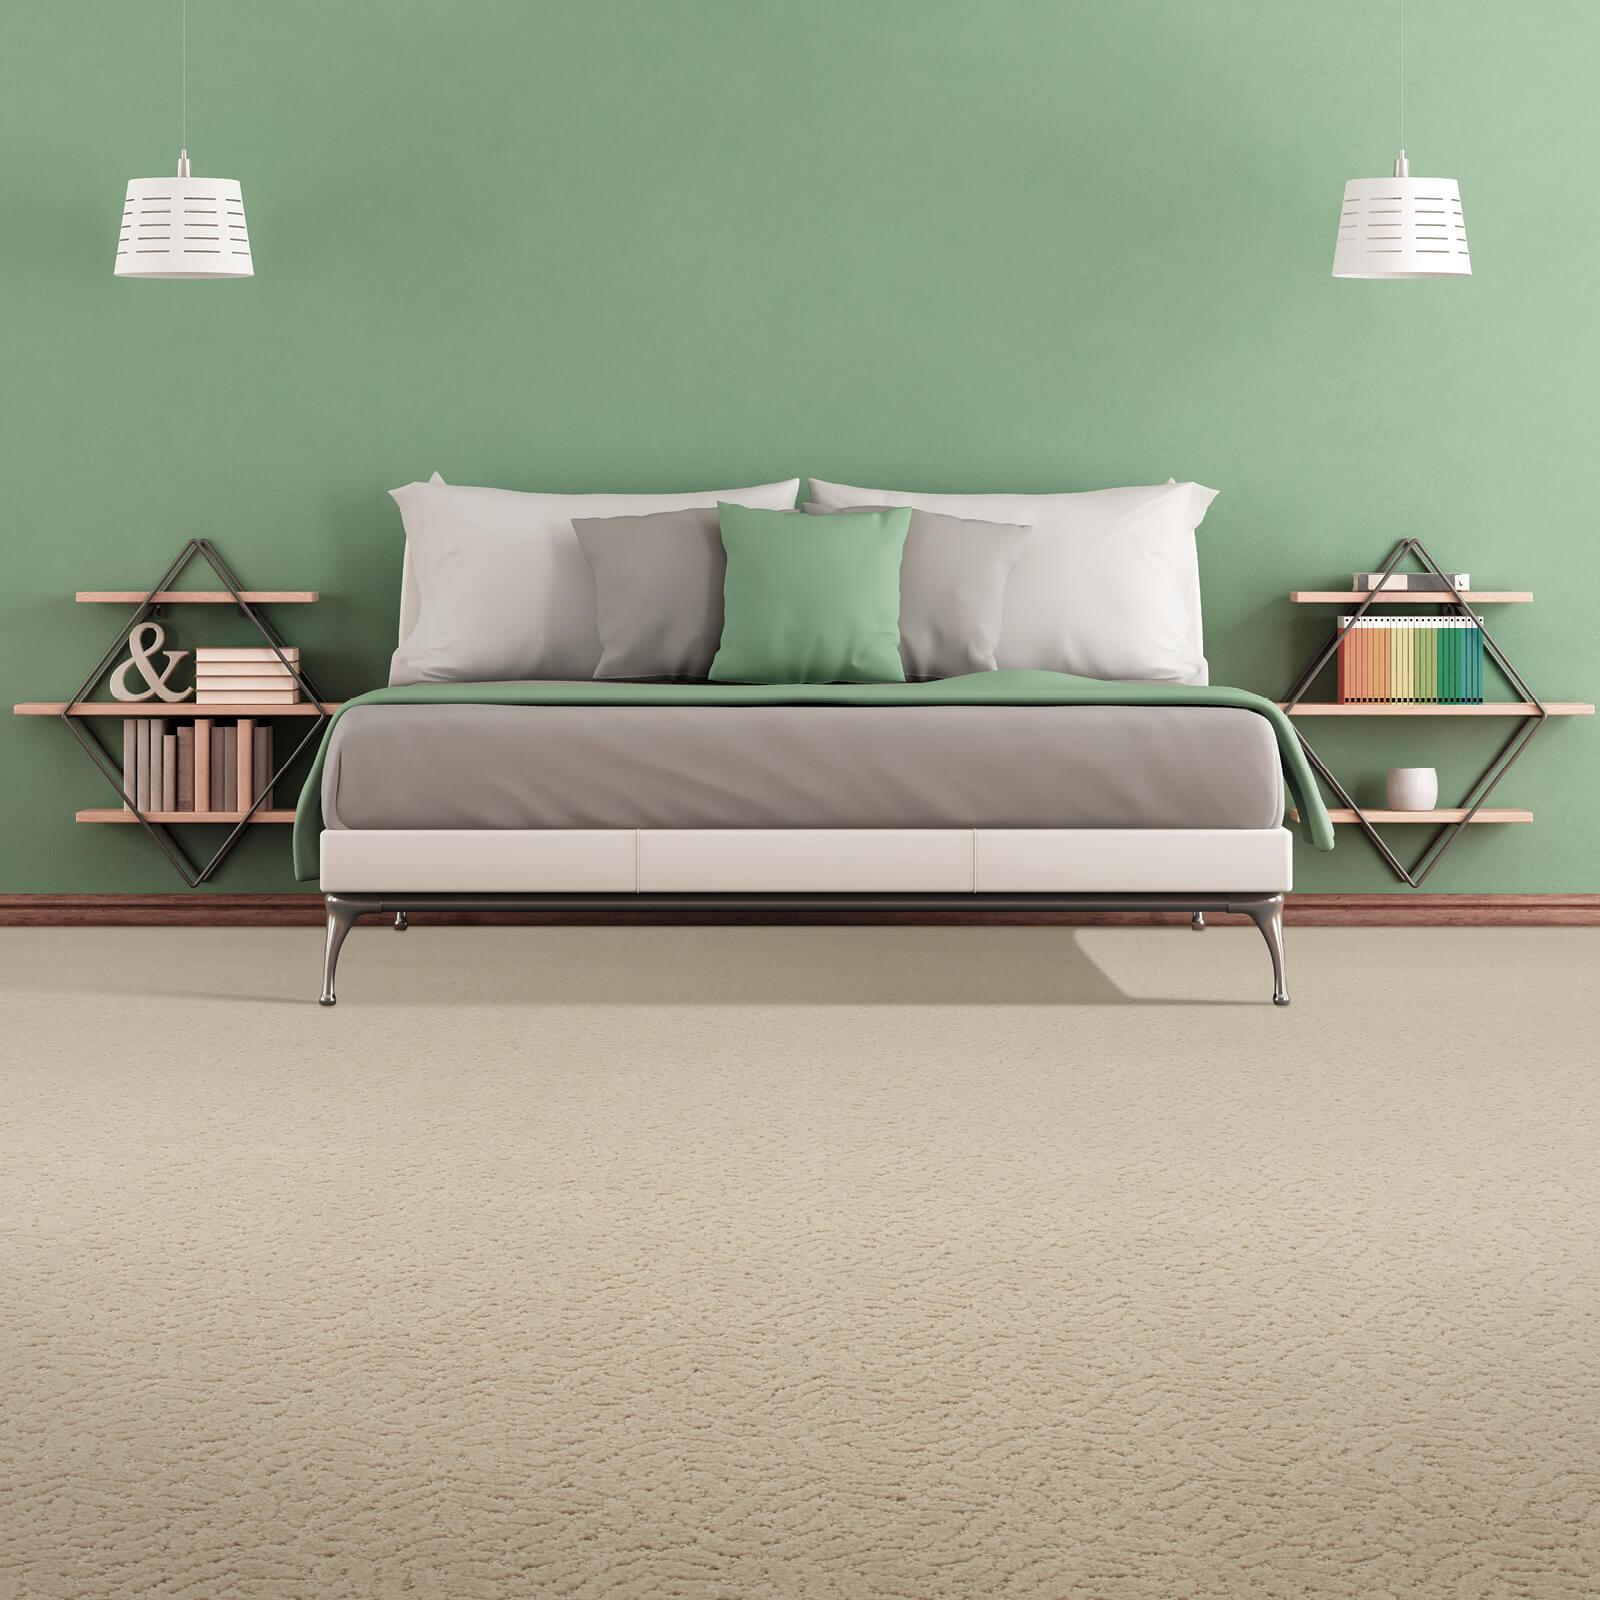 Bedroom view | J/K Carpet Center, Inc